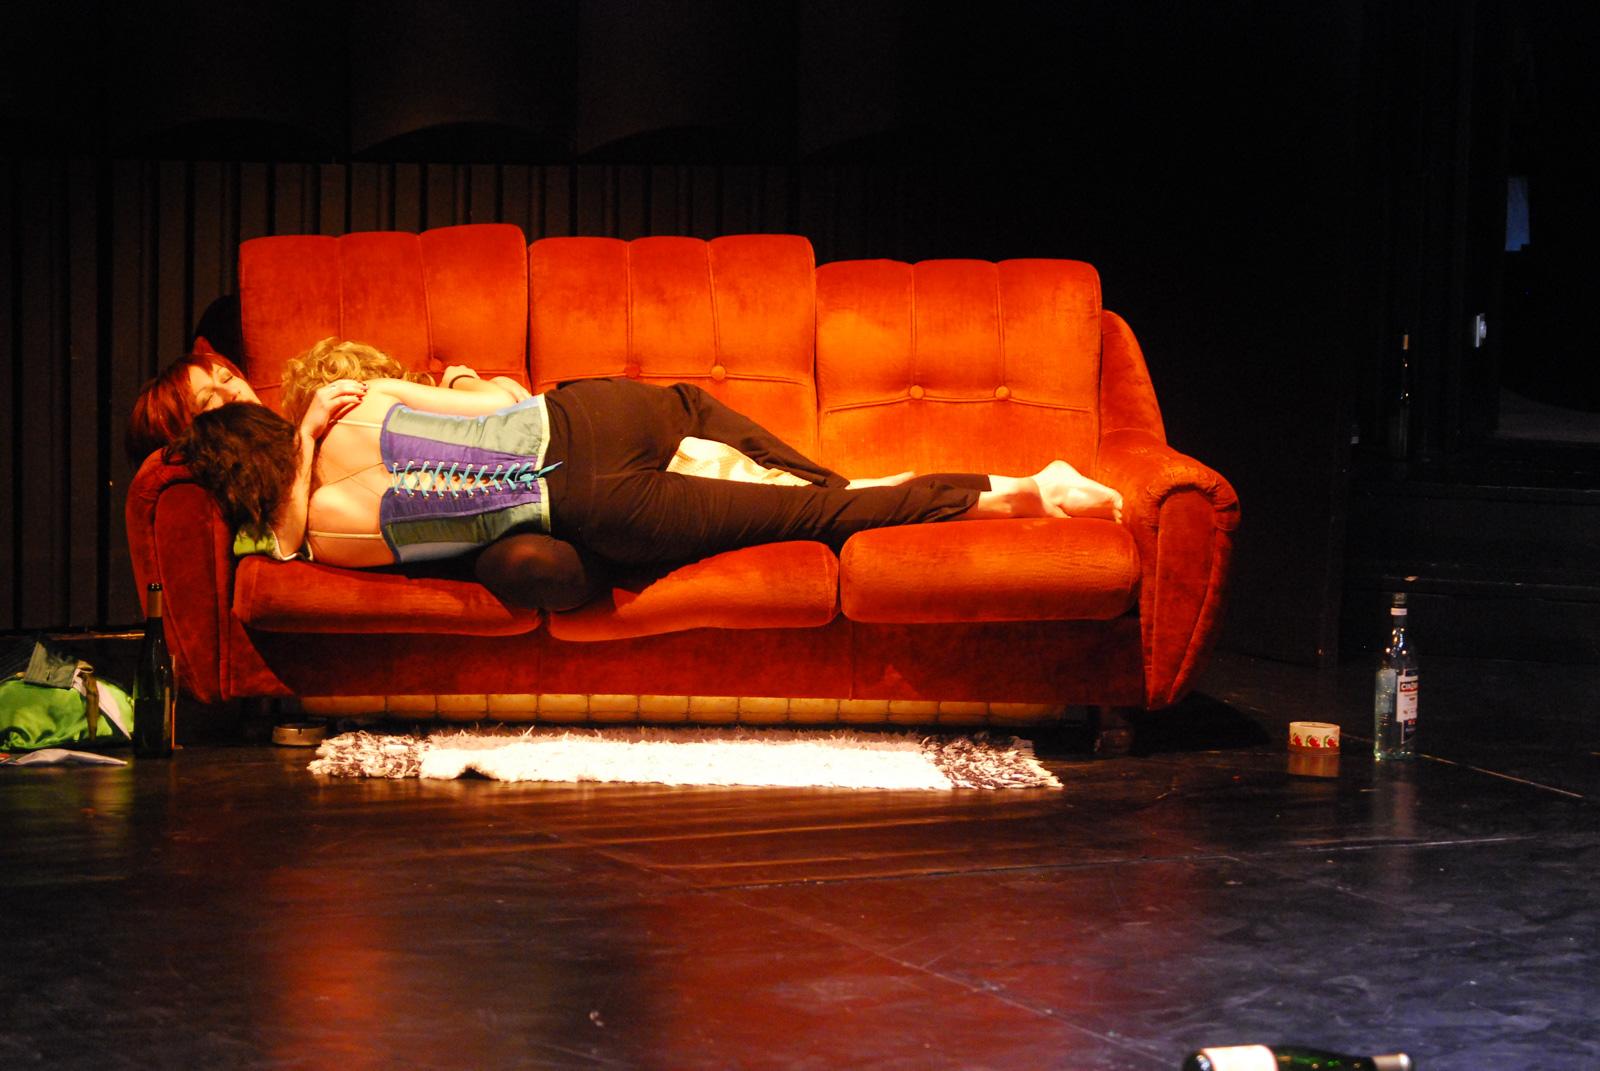 Teatro_Magico_Fantastico_6.jpg